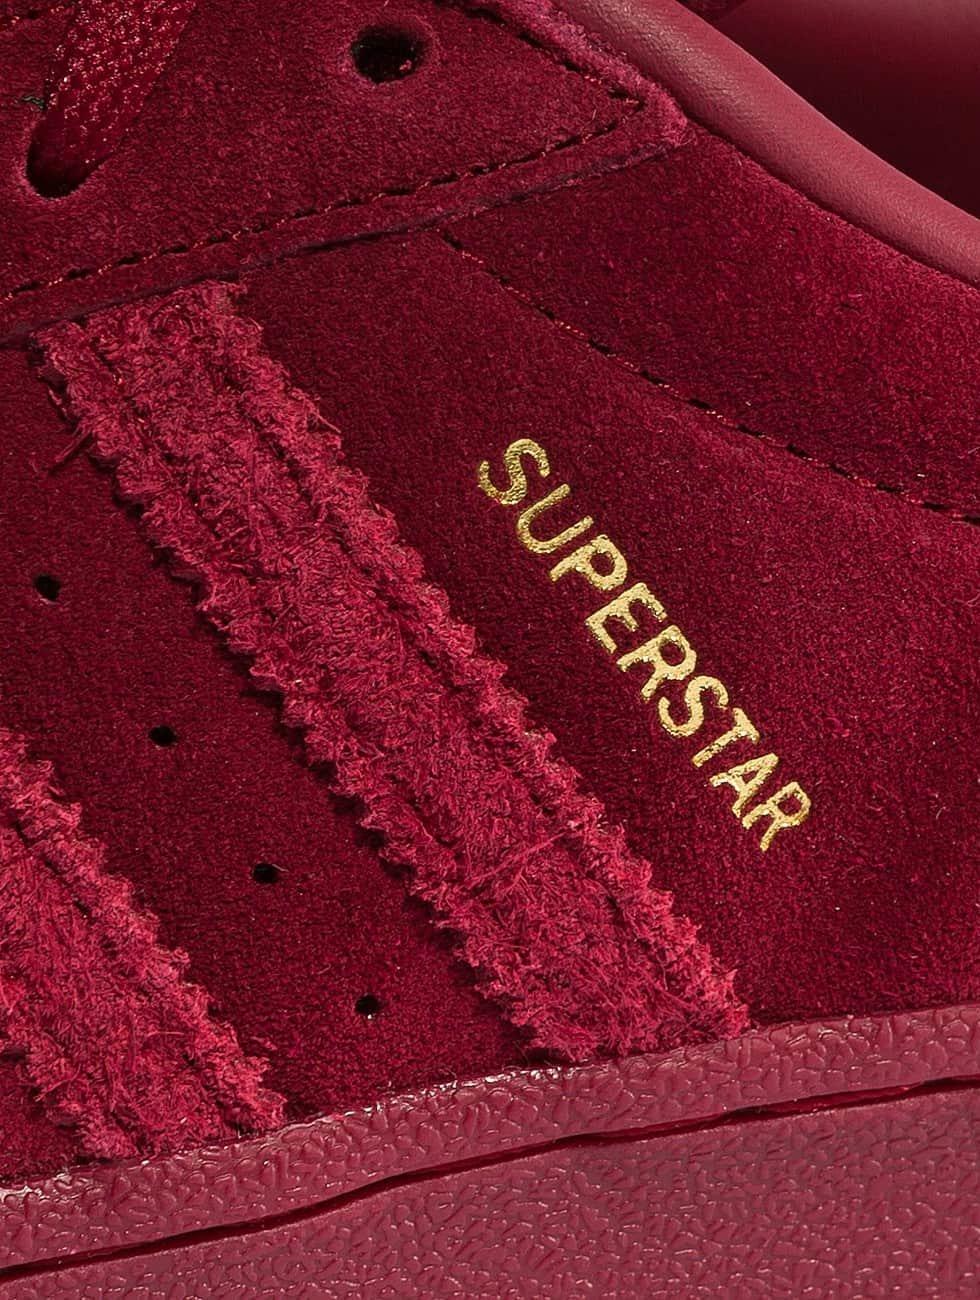 Adidas Originals Scarpe / Sneakers Sneaker Superstar Rosso 359 420 btvazQYt